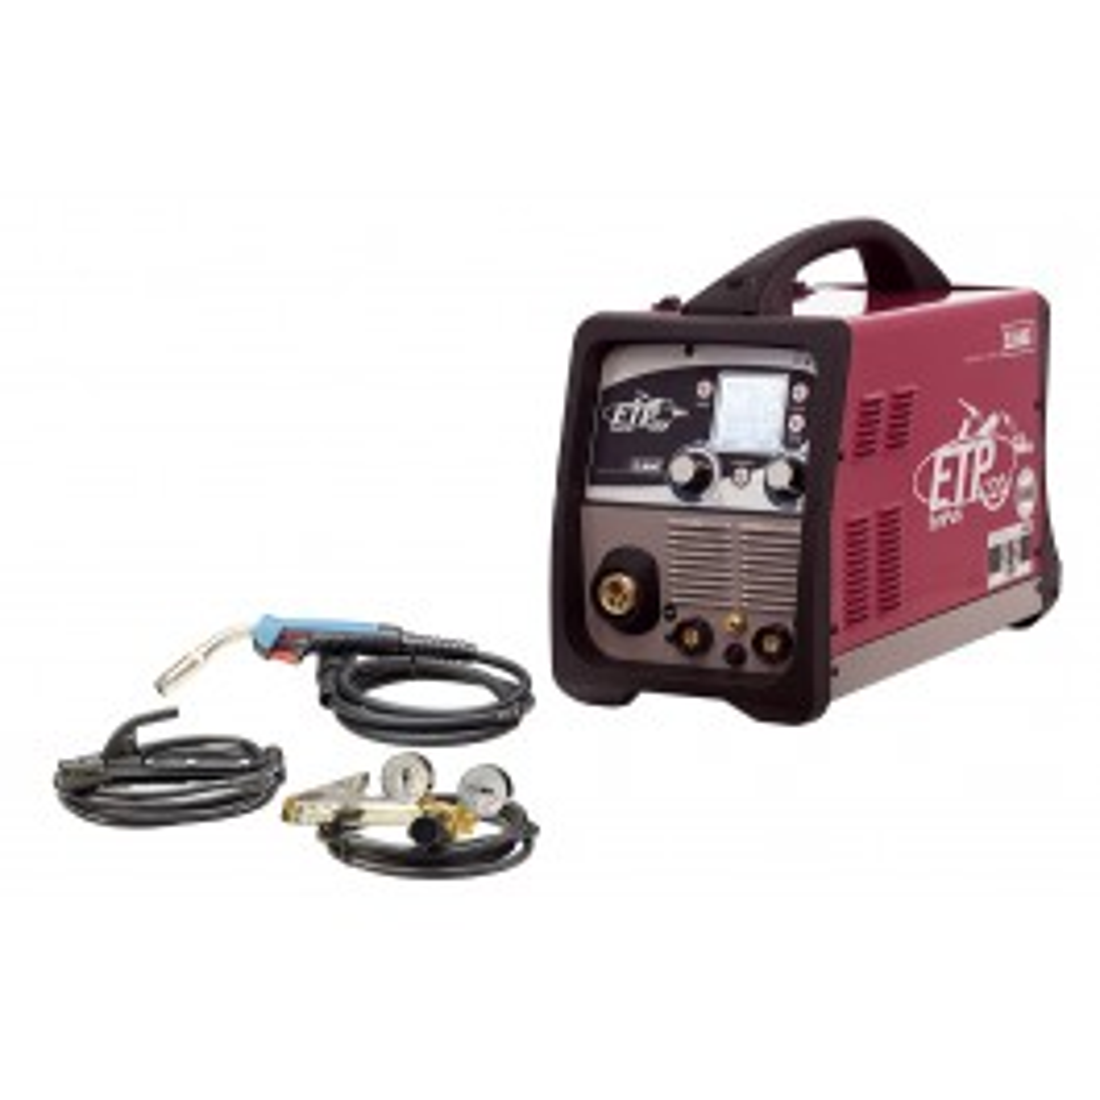 Multifunction welding inverter, portable - STEEL SET